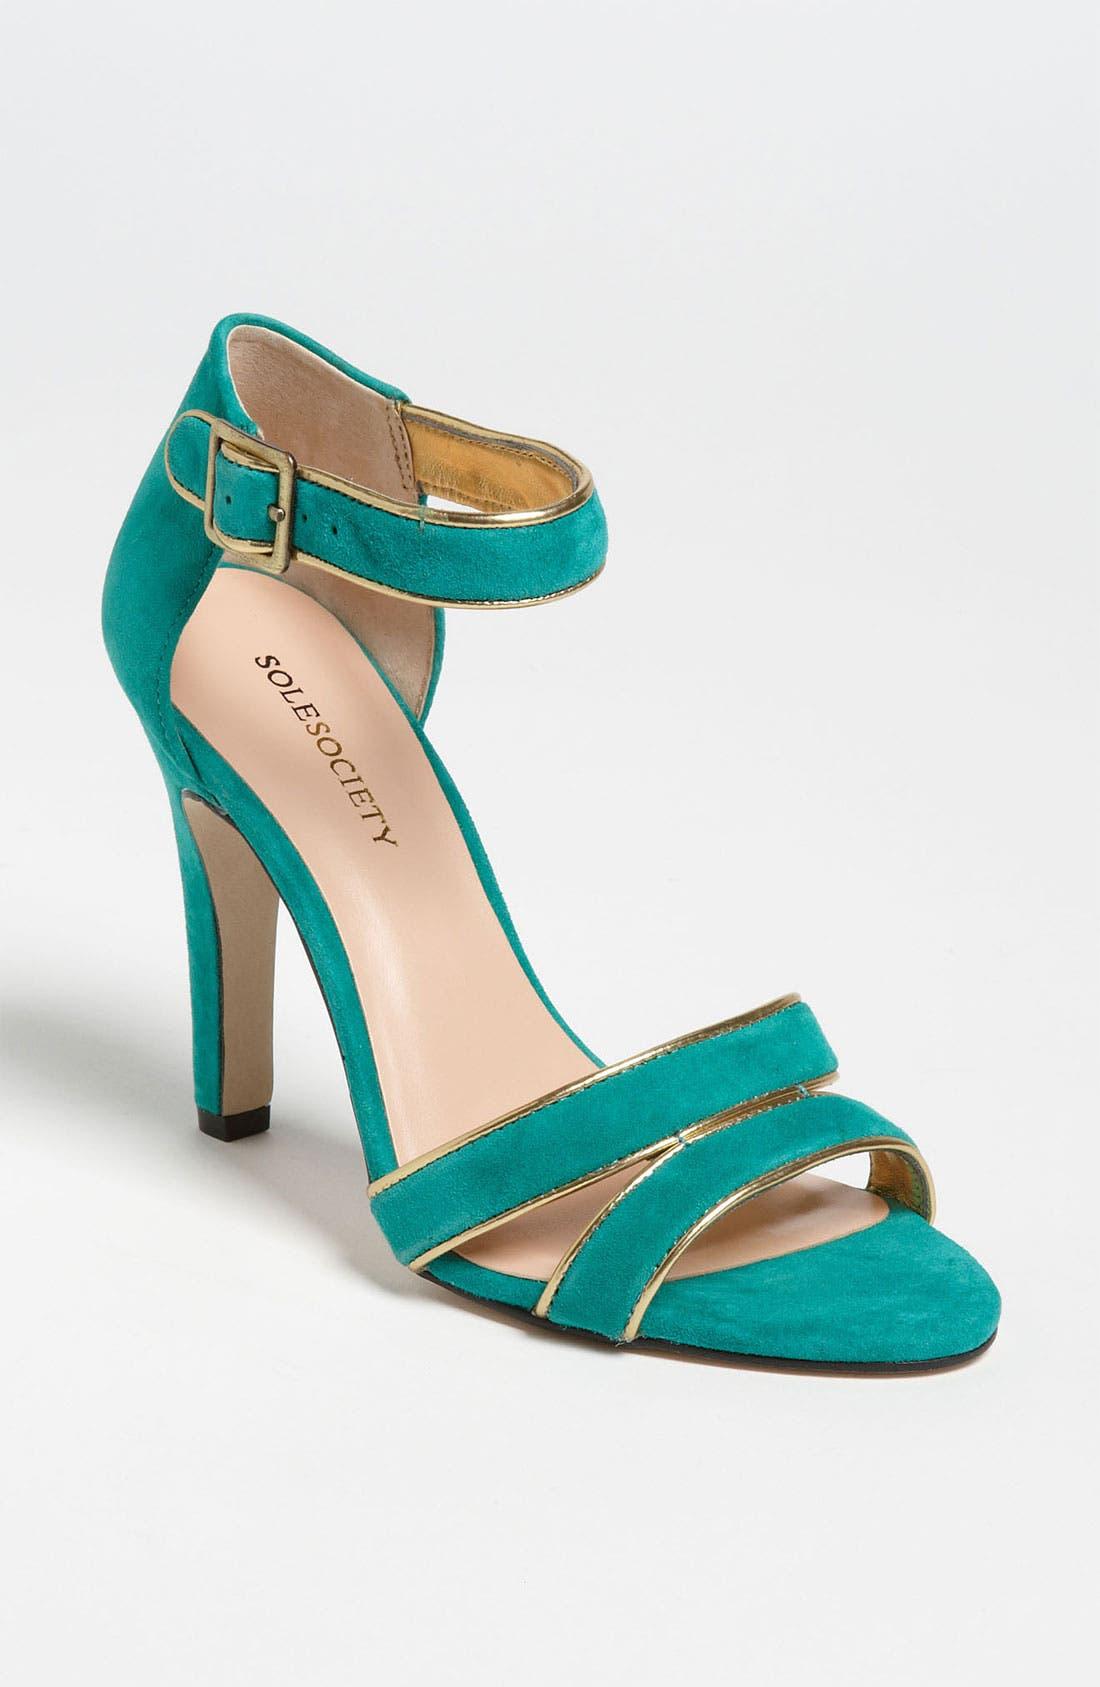 Main Image - Sole Society 'Ophelia' Sandal